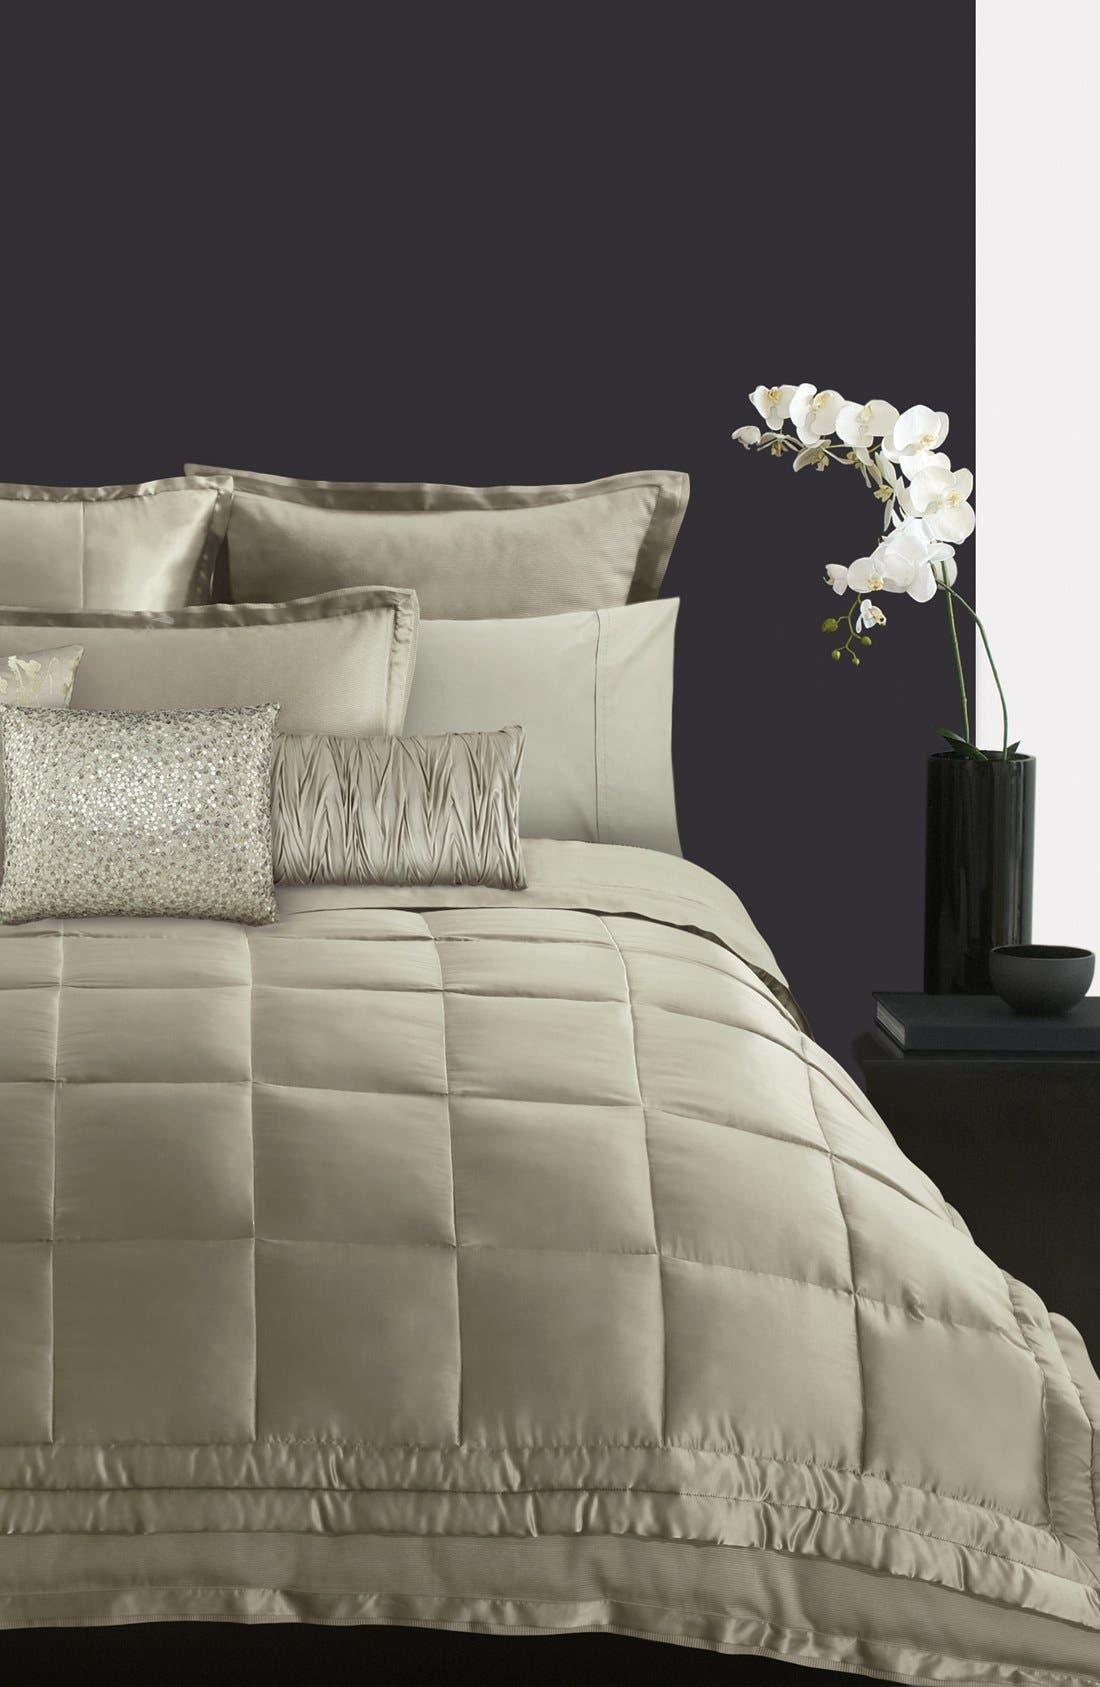 Alternate Image 1 Selected - Donna Karan 'Modern Classics' Silk & Cotton Quilt (Online Only)